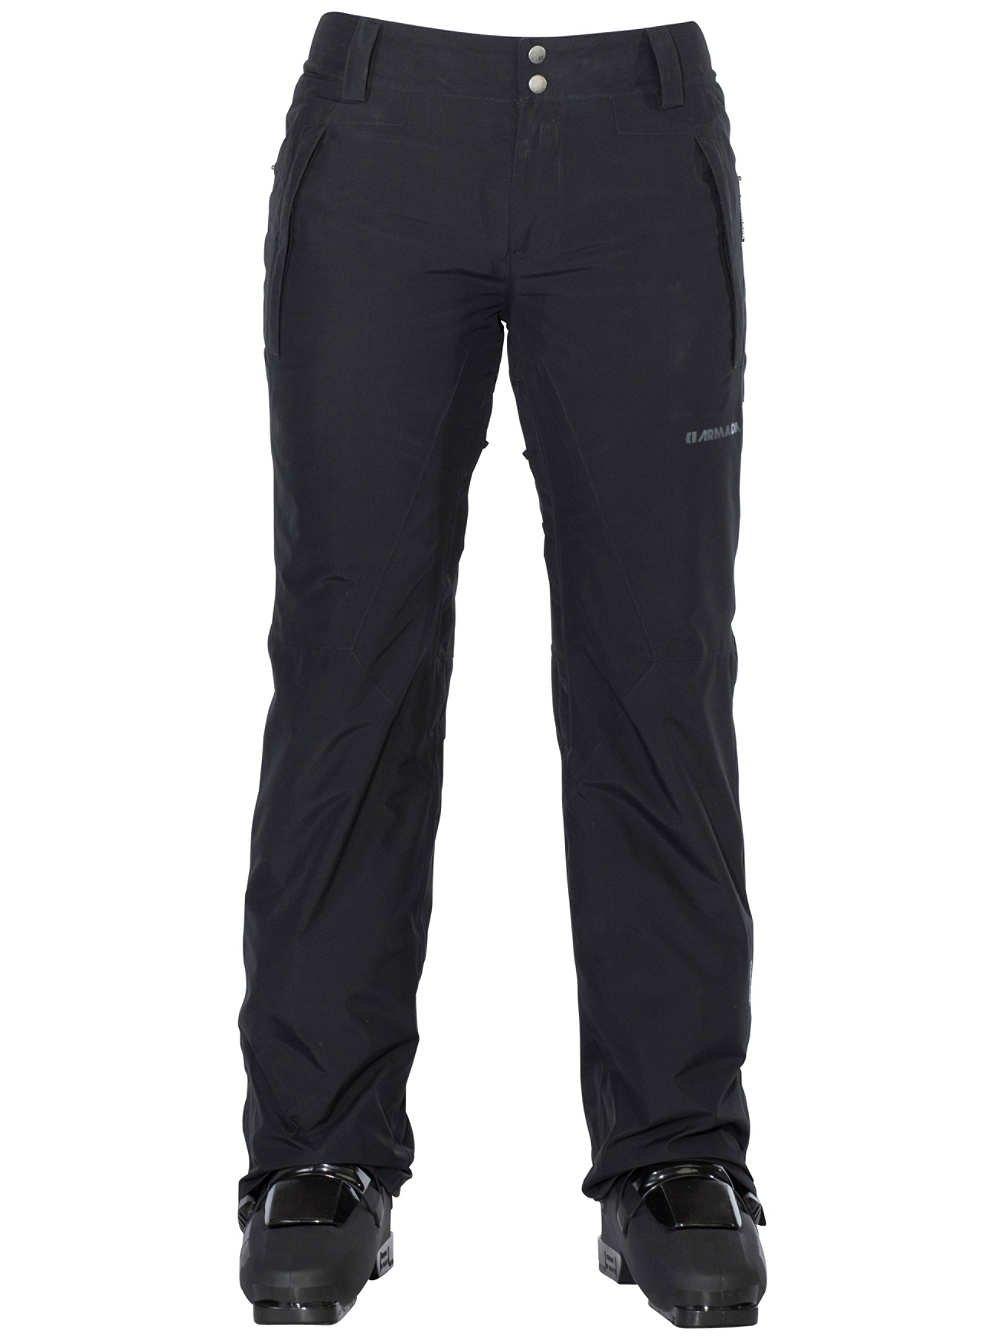 Armada Vista GORE TEX Pant – Women 's B0731W2YYD  ブラック Small